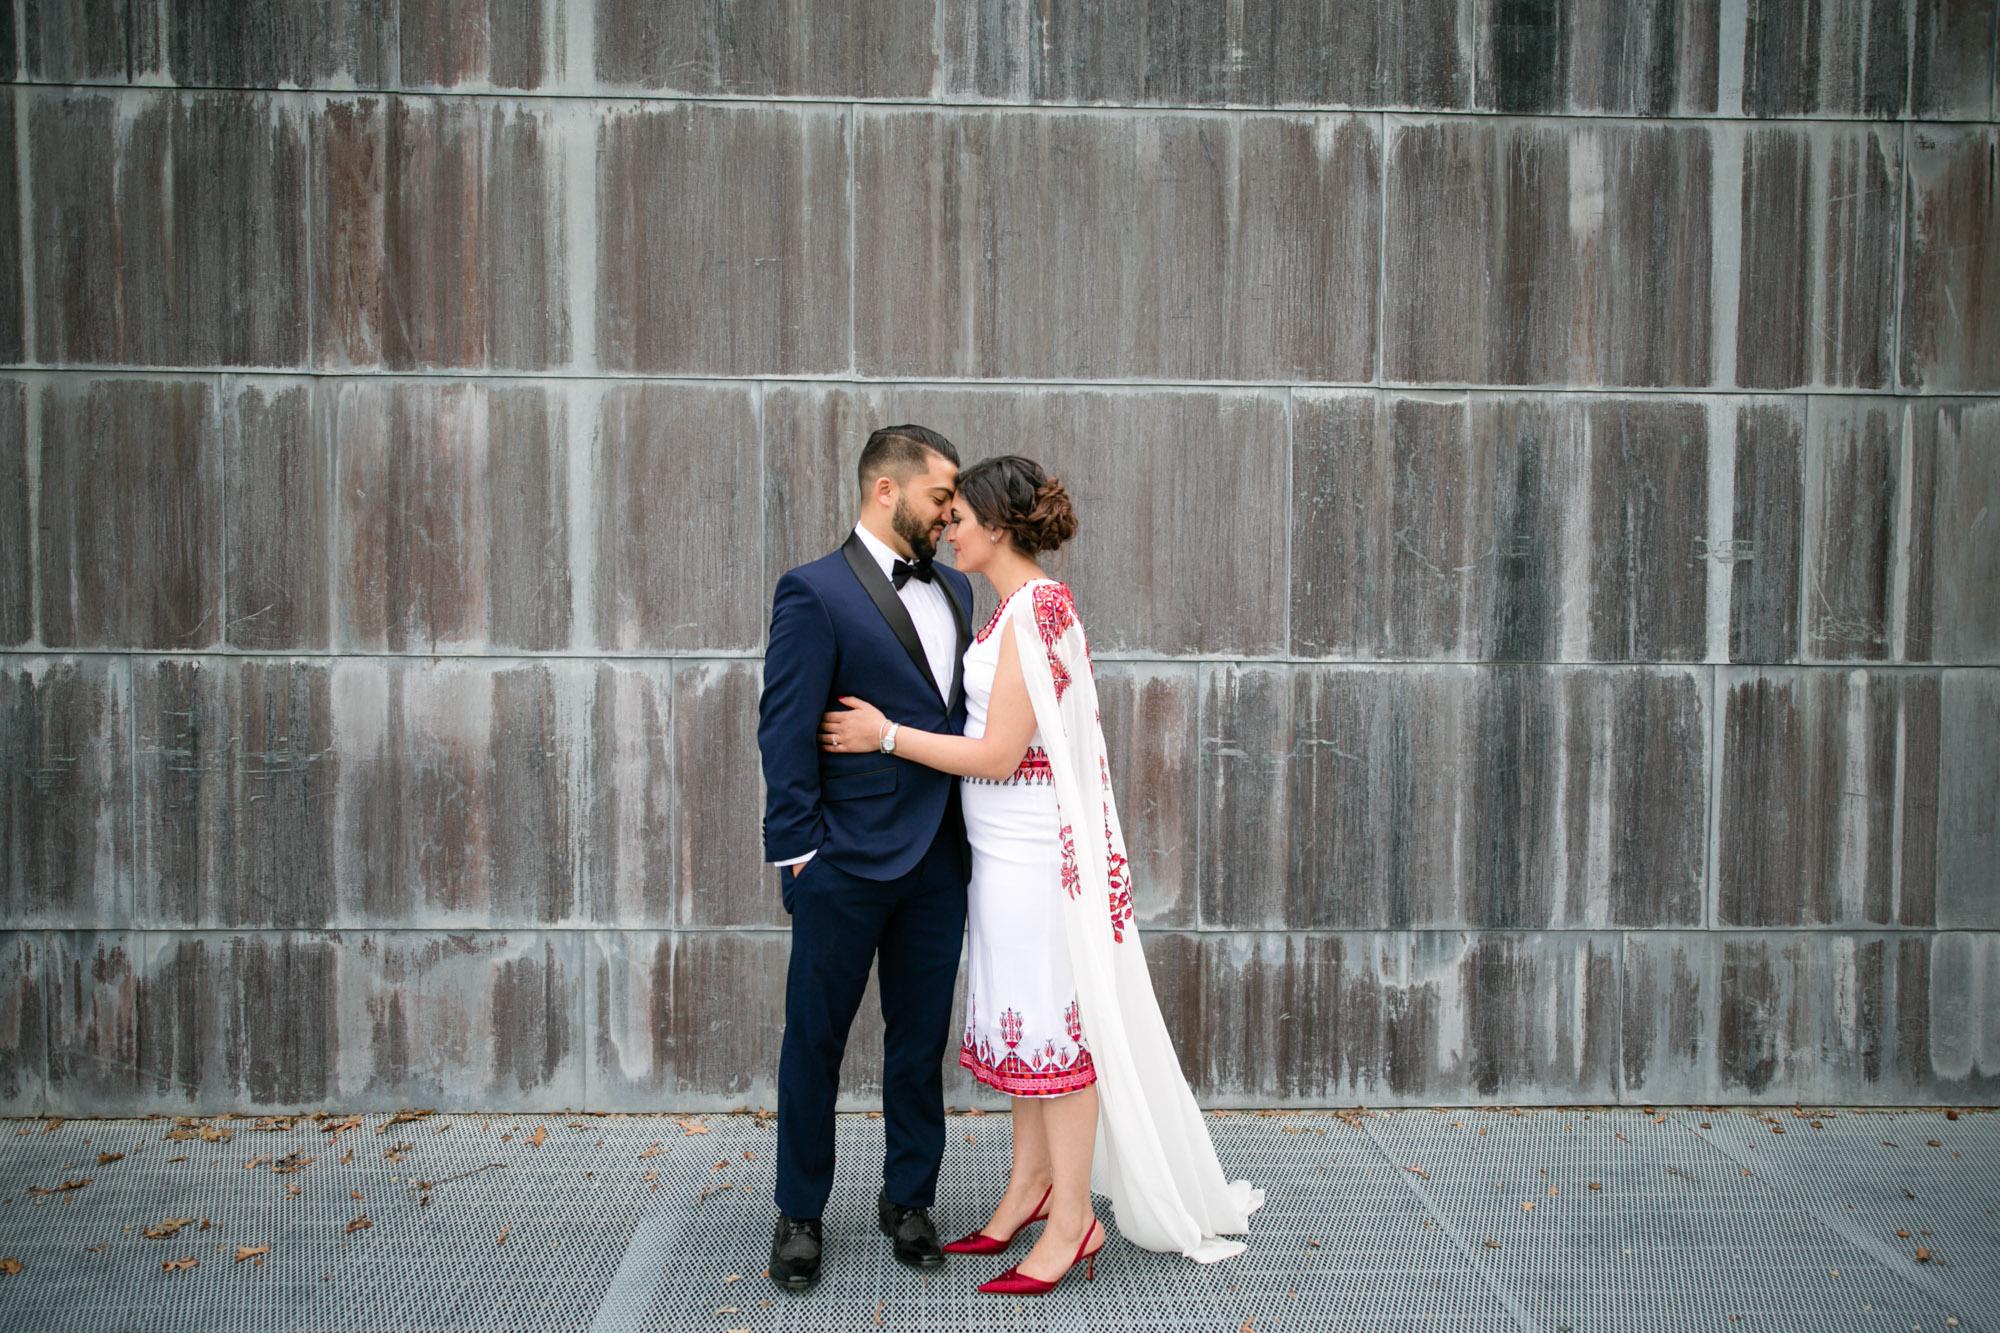 glass-pavilion-toledo-wedding-17.jpg